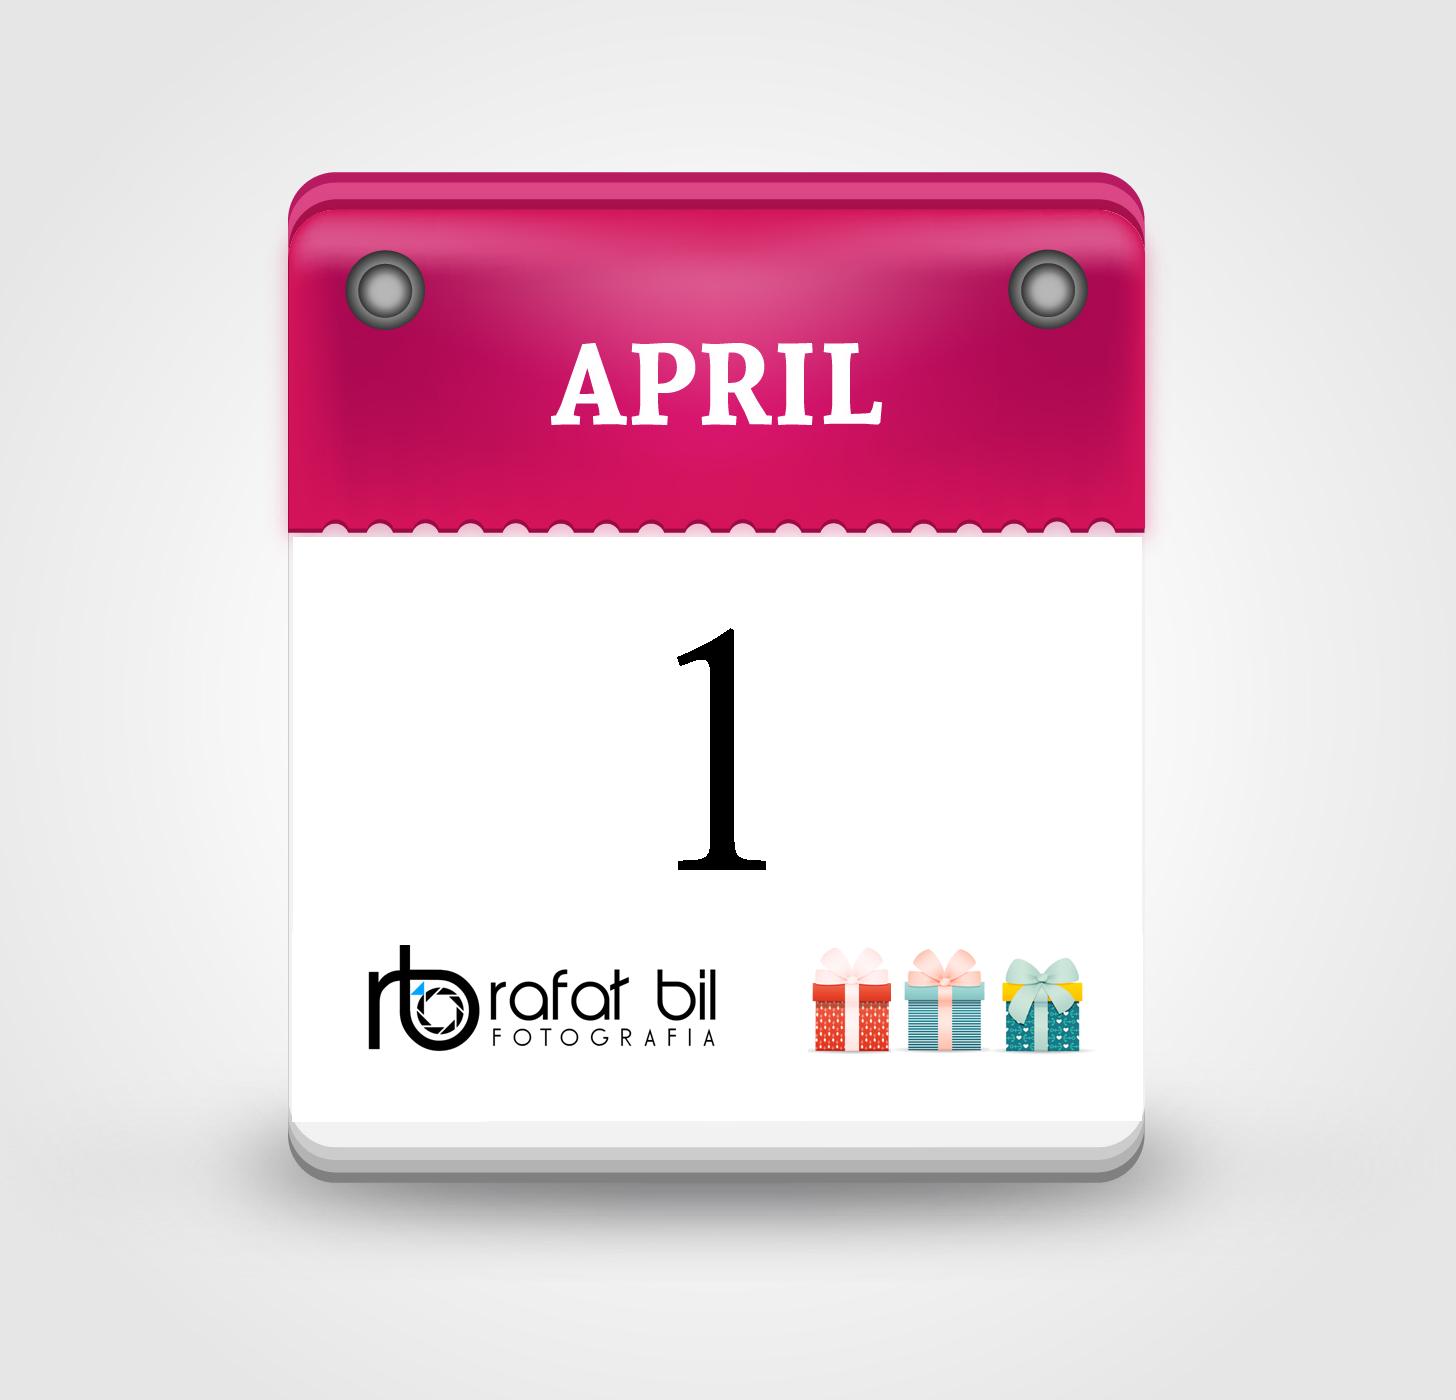 sesje zdjęciowe na prima aprilis